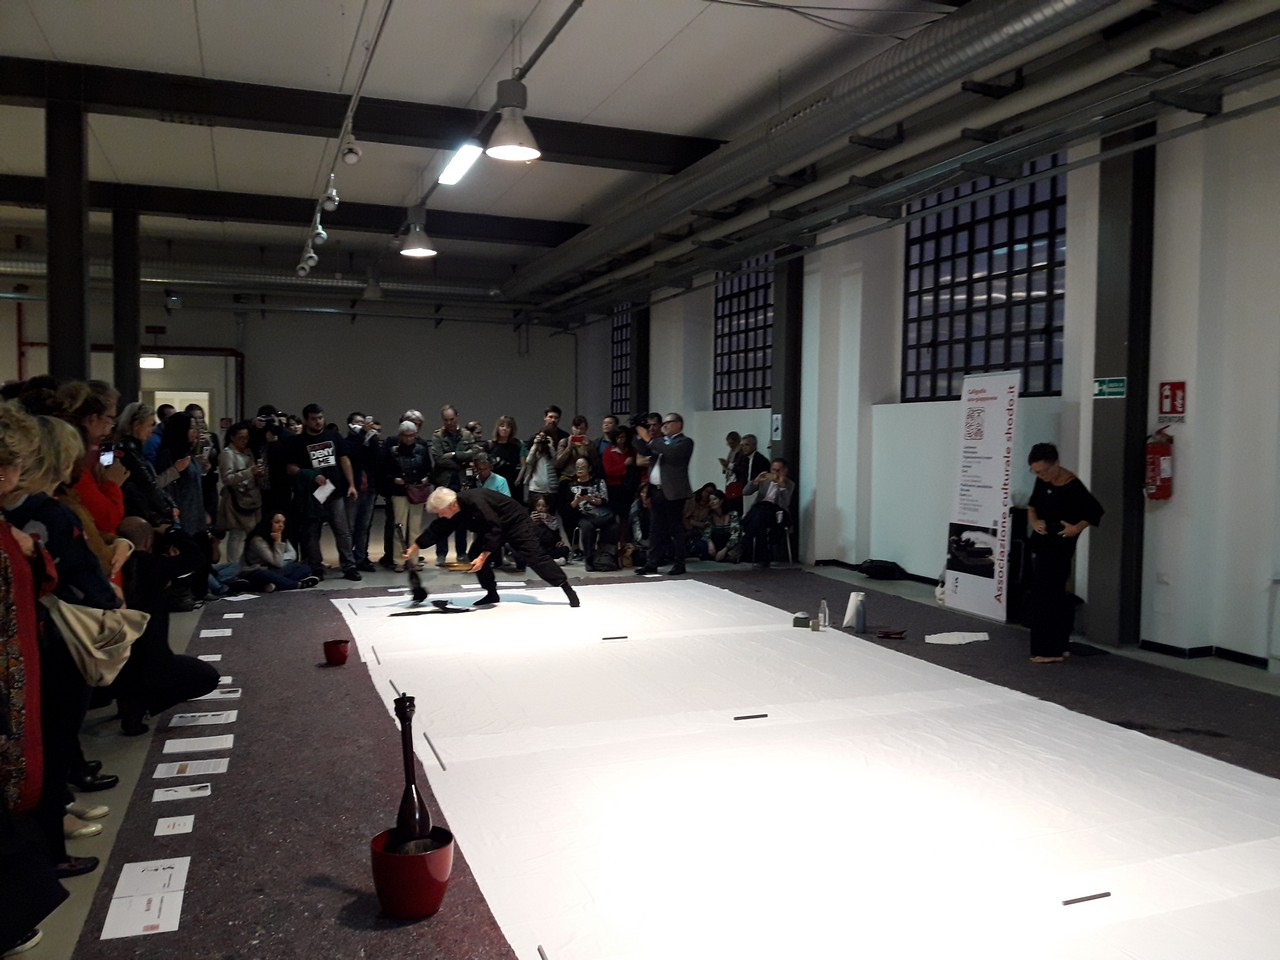 JapanFestival-Milano2018-fotoPagineZeni_001